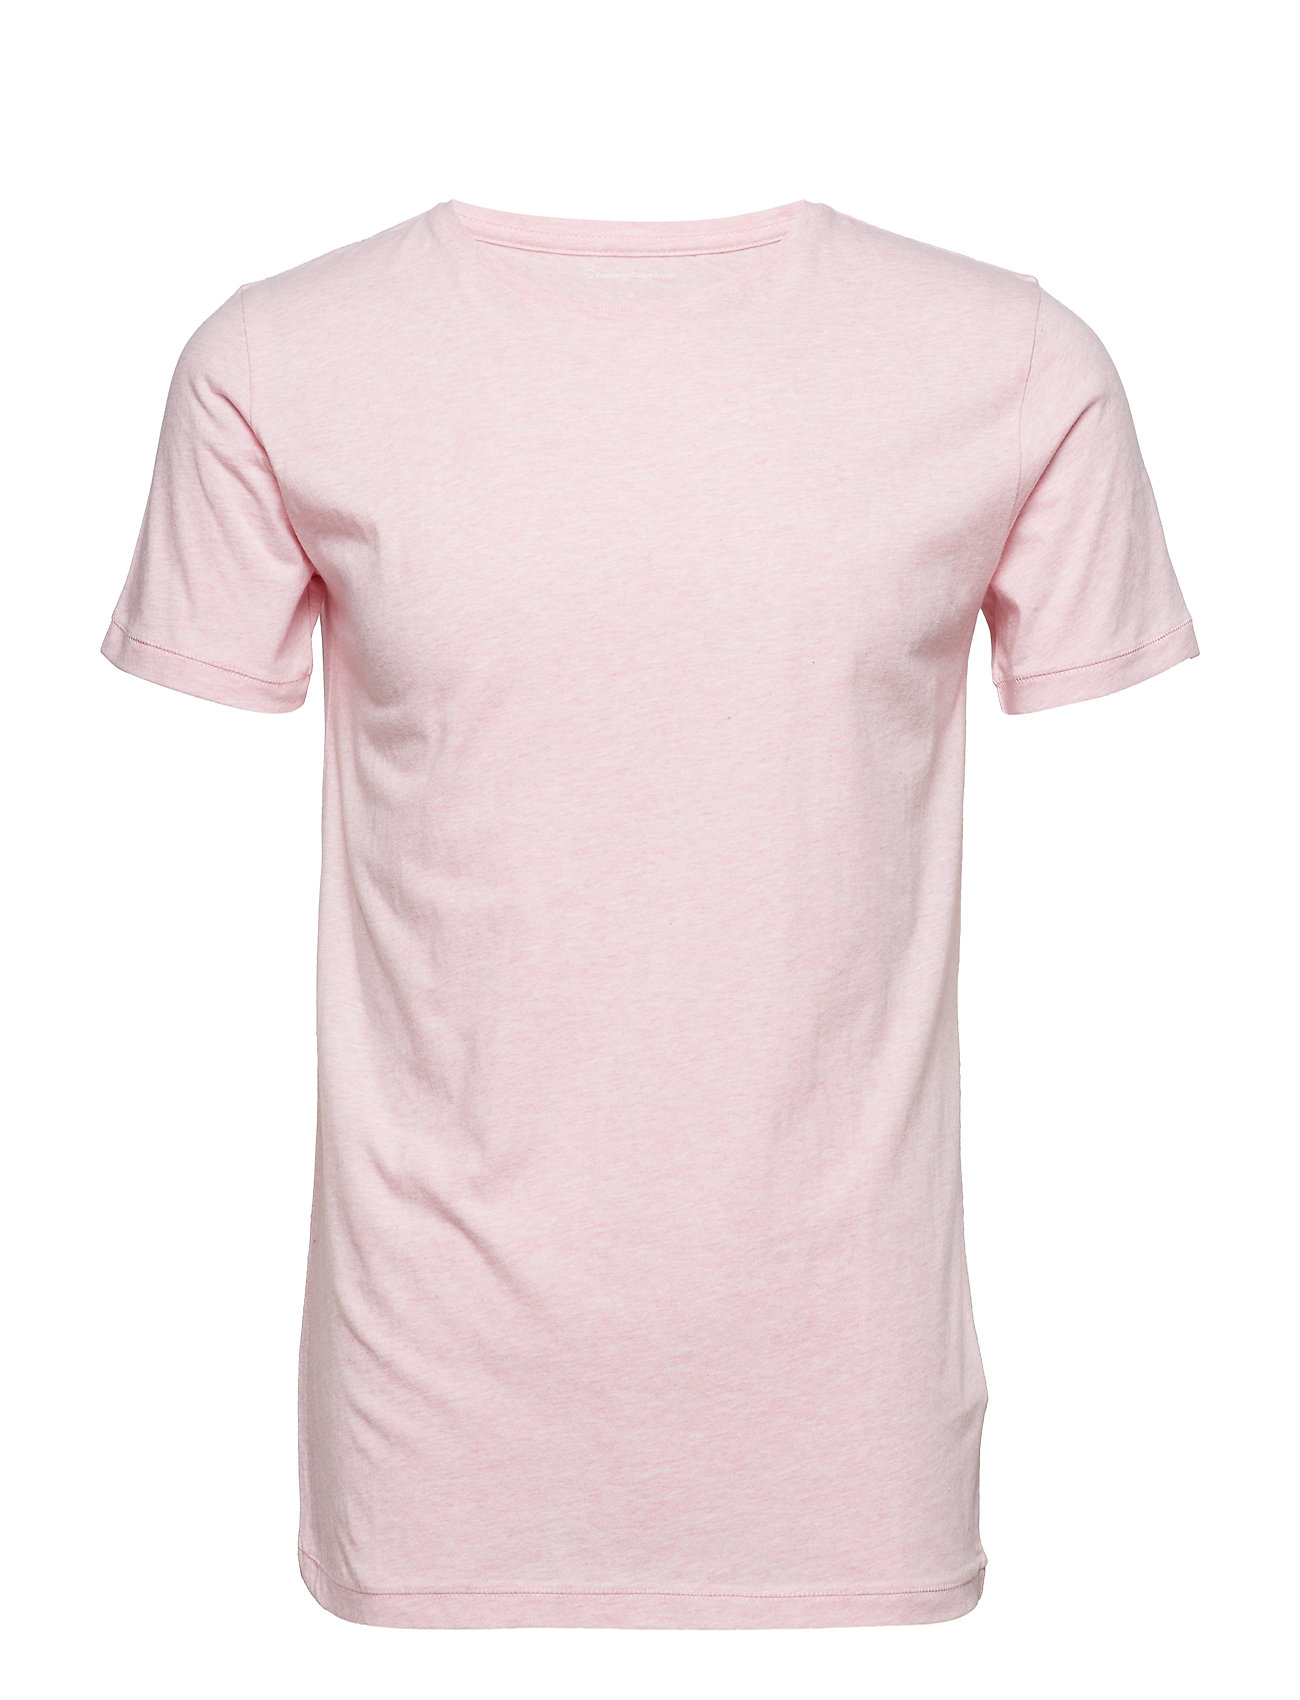 Knowledge Cotton Apparel ALDER basic tee - GOTS/Vegan - PINK MELANGE